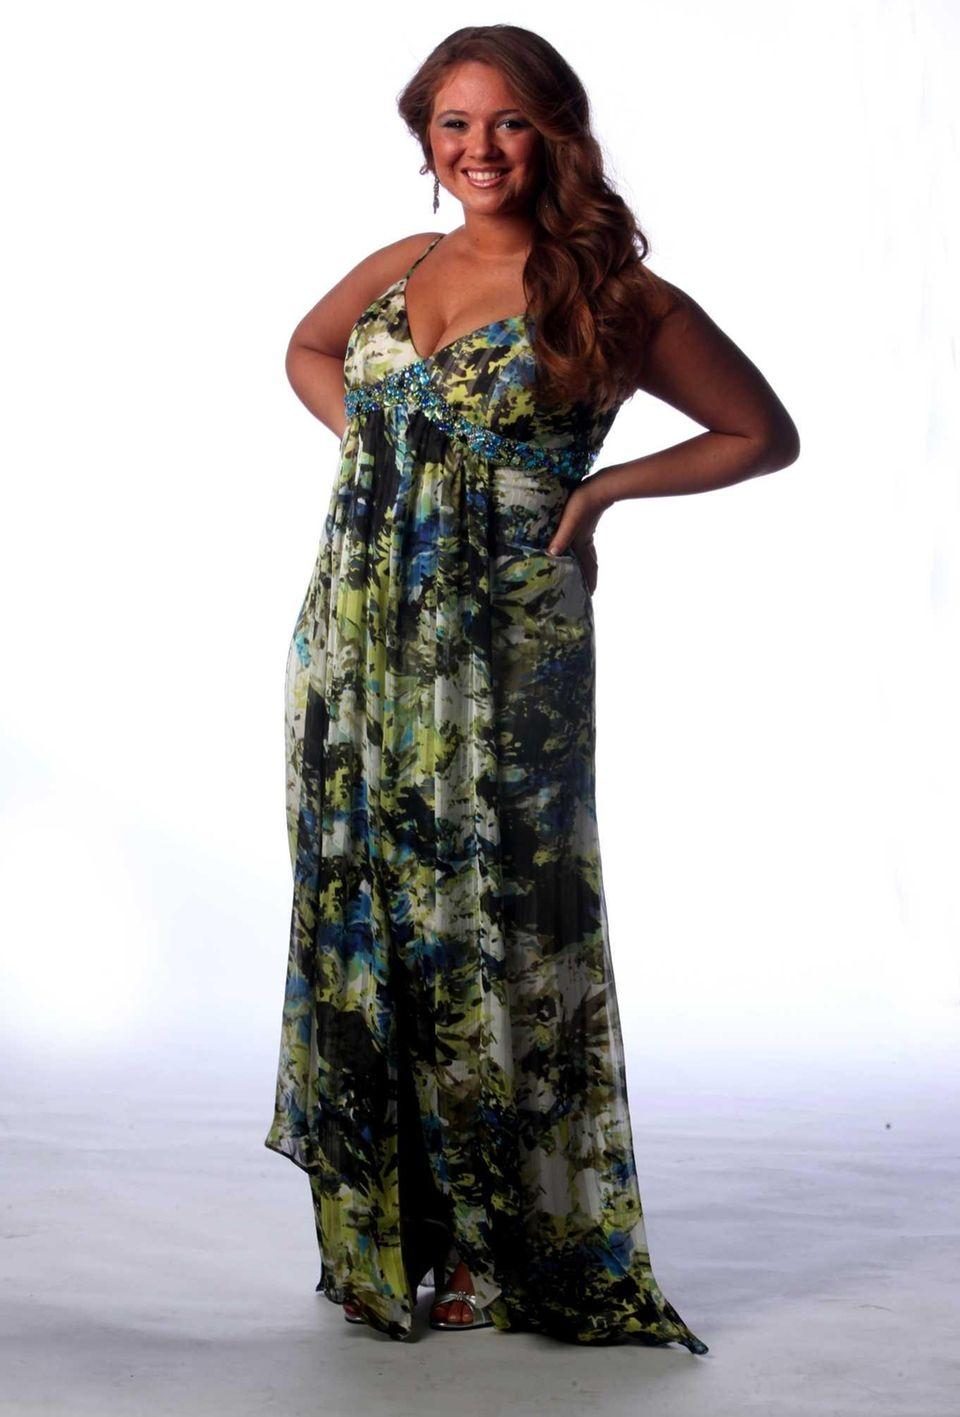 Danielle Trotta, 2013 Project Prom winner.